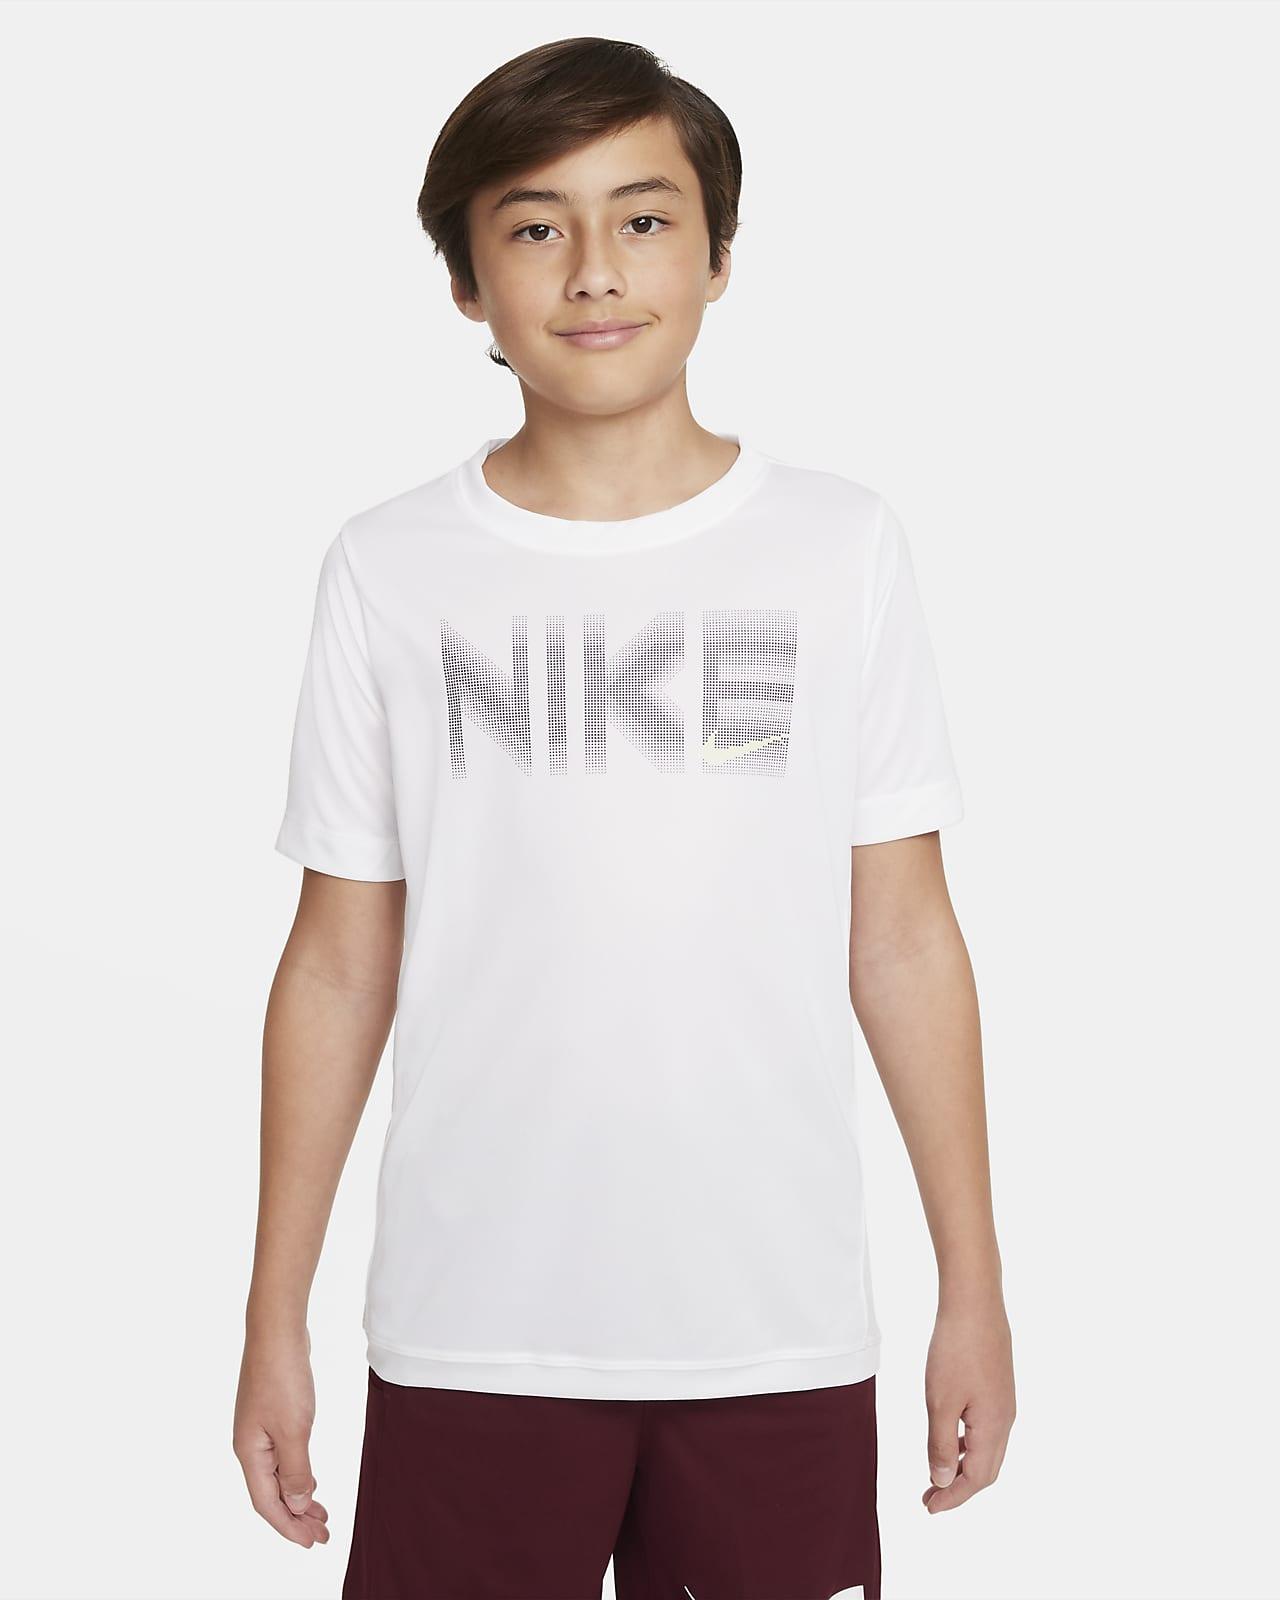 Nike Trophy Big Kids' (Boys') Short-Sleeve Graphic Top